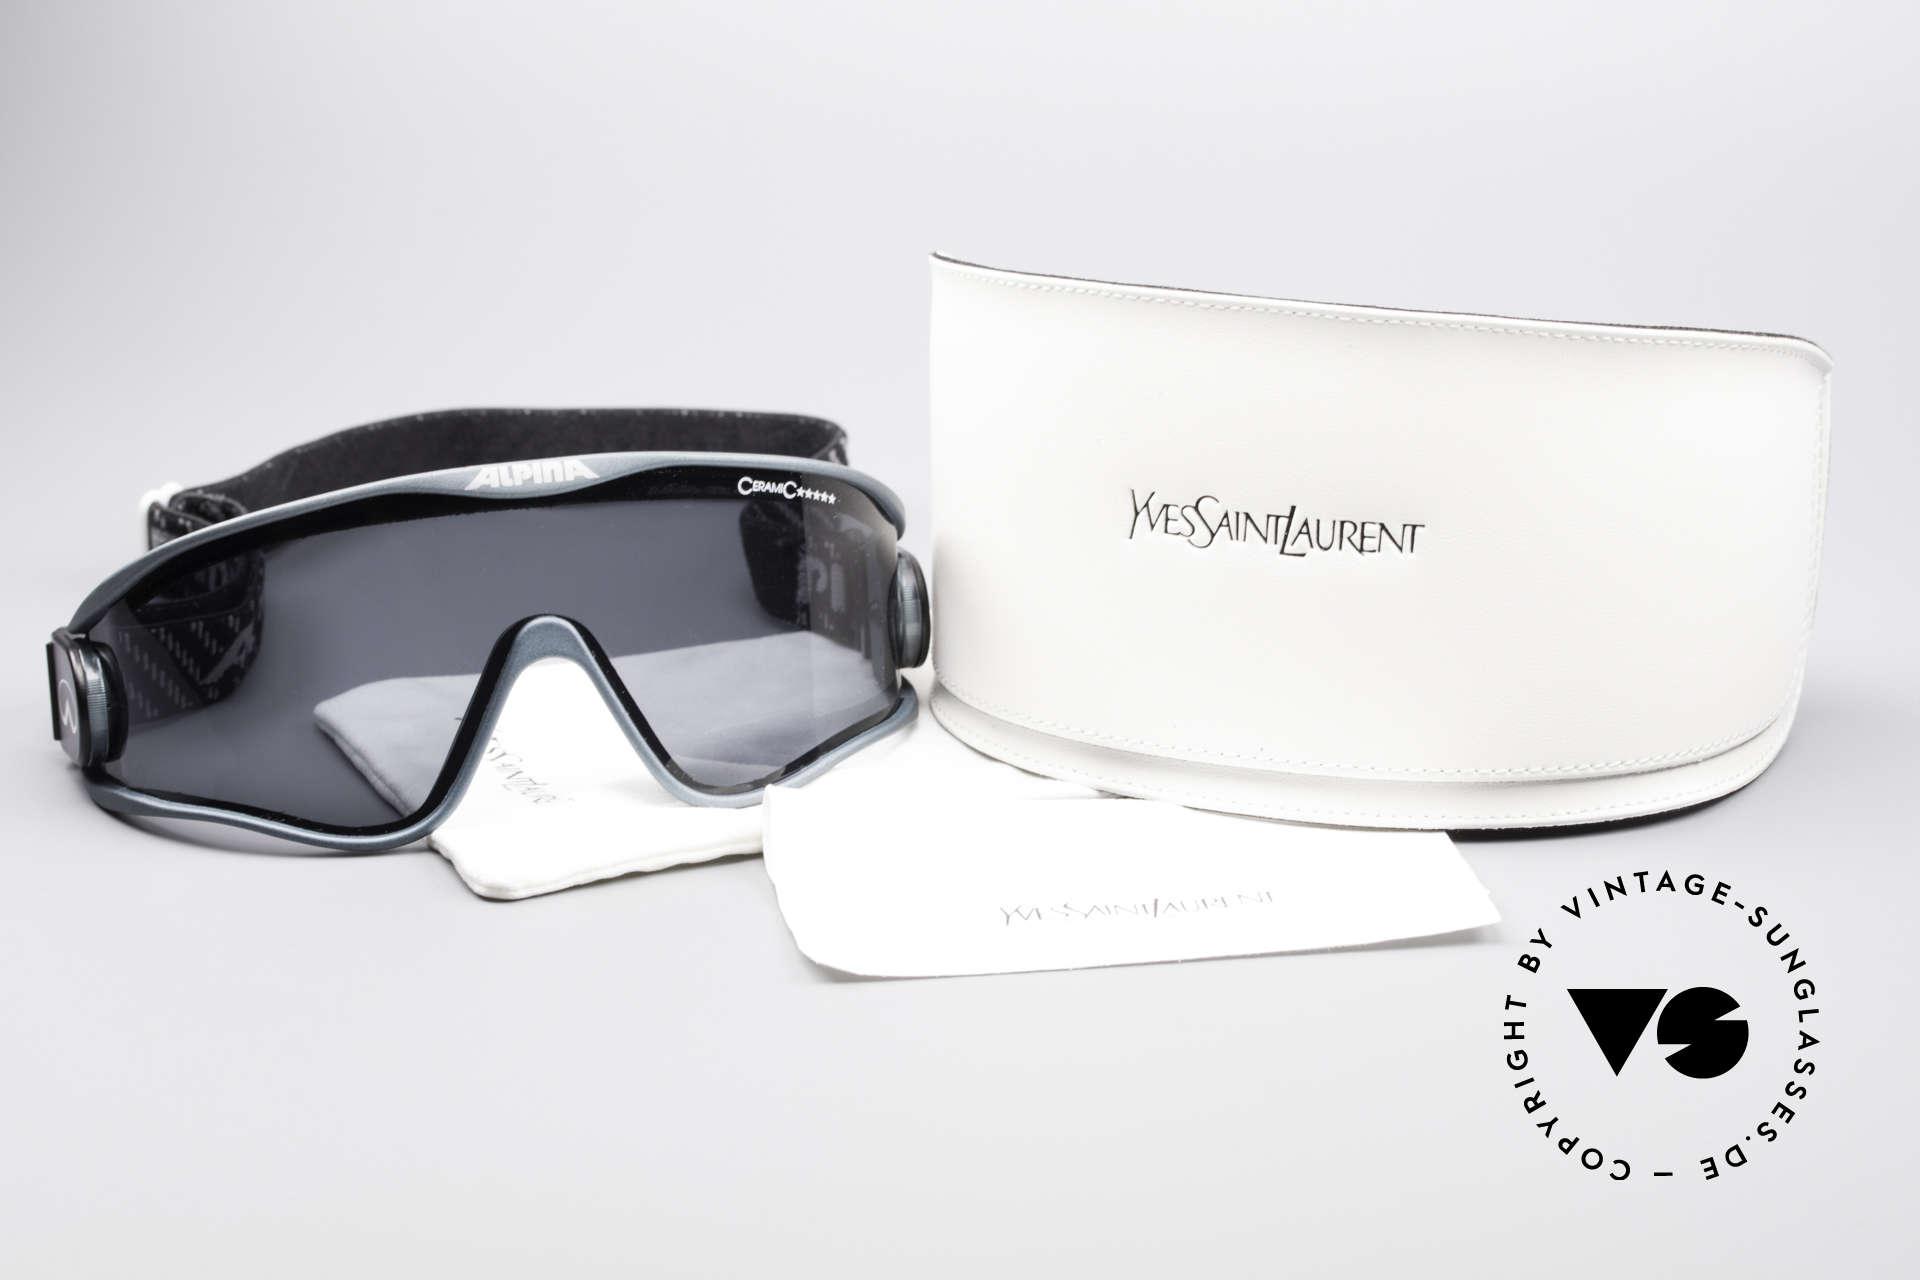 Alpina S3 Ceramic 90's Celebrity Sunglasses, NO RETRO SHADES; but a are old 1990's ORIGINAL!, Made for Men and Women